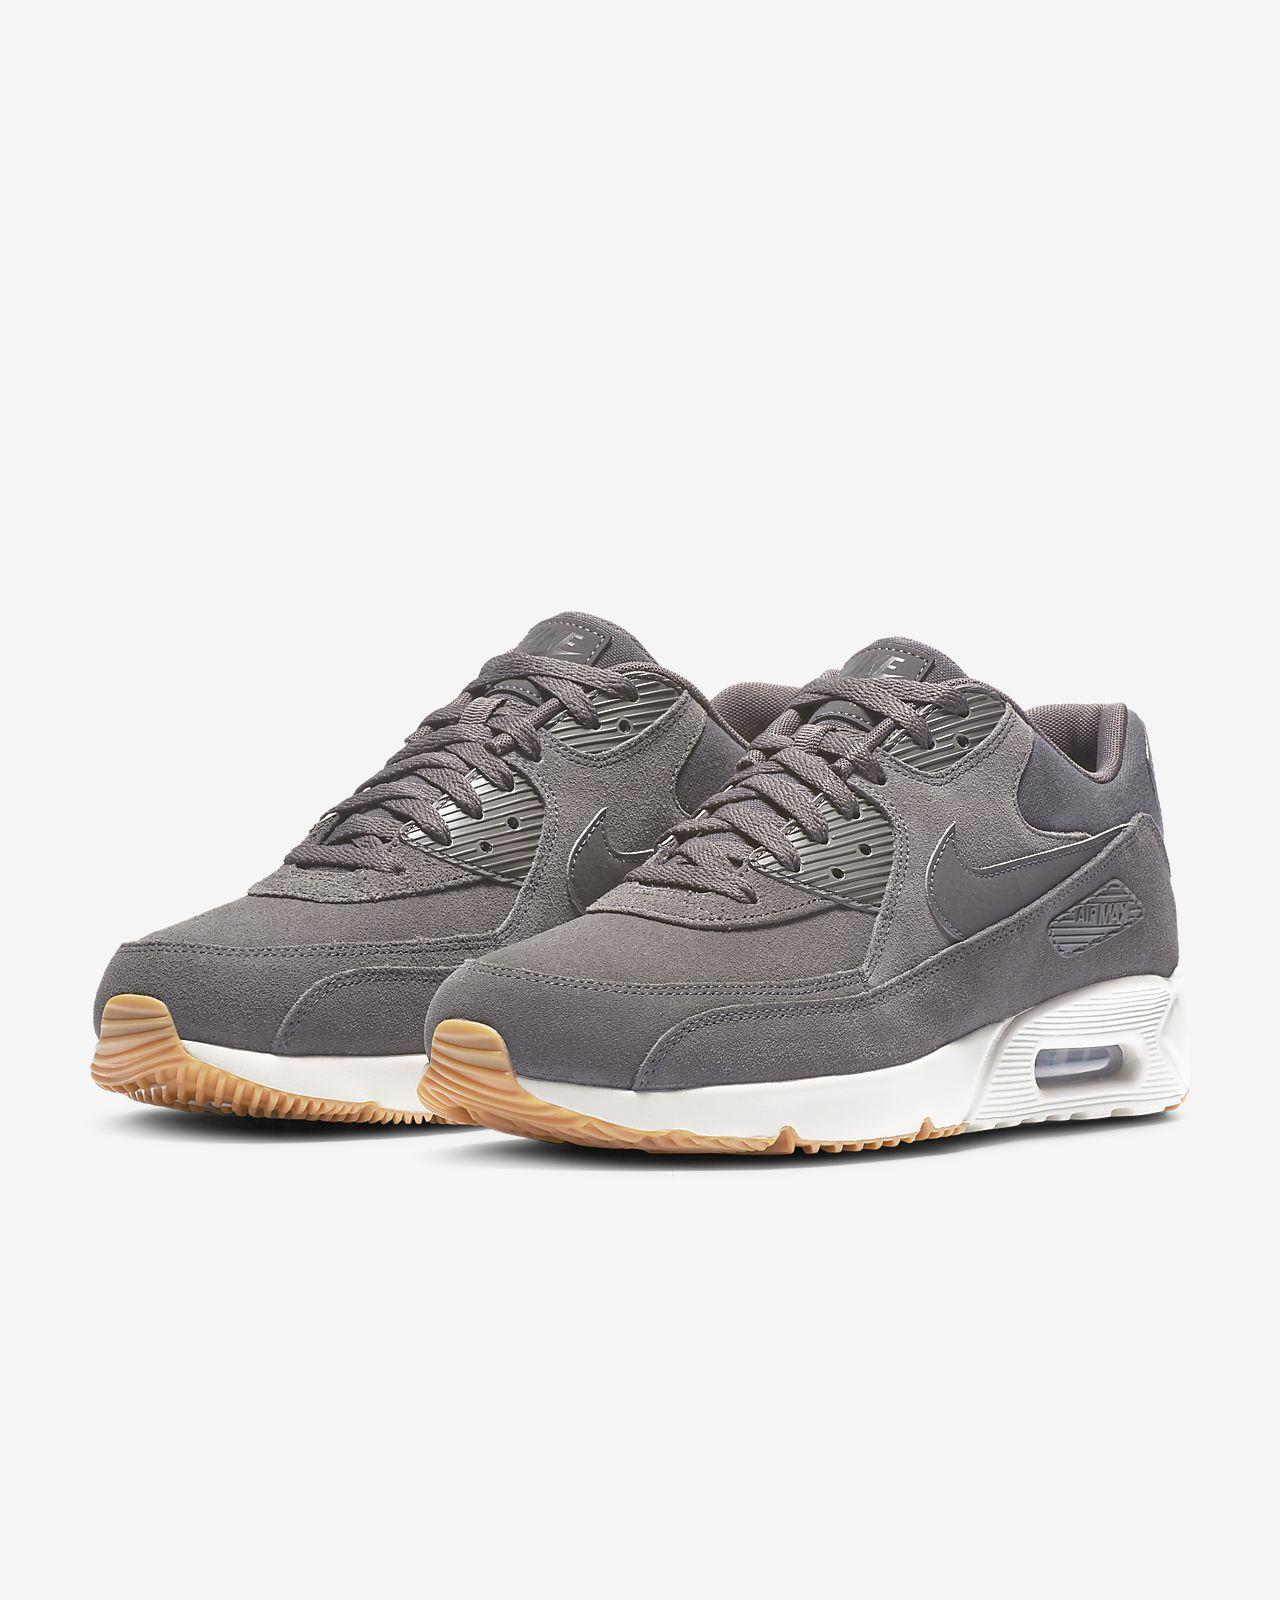 wholesale dealer 10f2f 1e393 ... Nike Air Max 90 Ultra 2.0 Men s Shoe